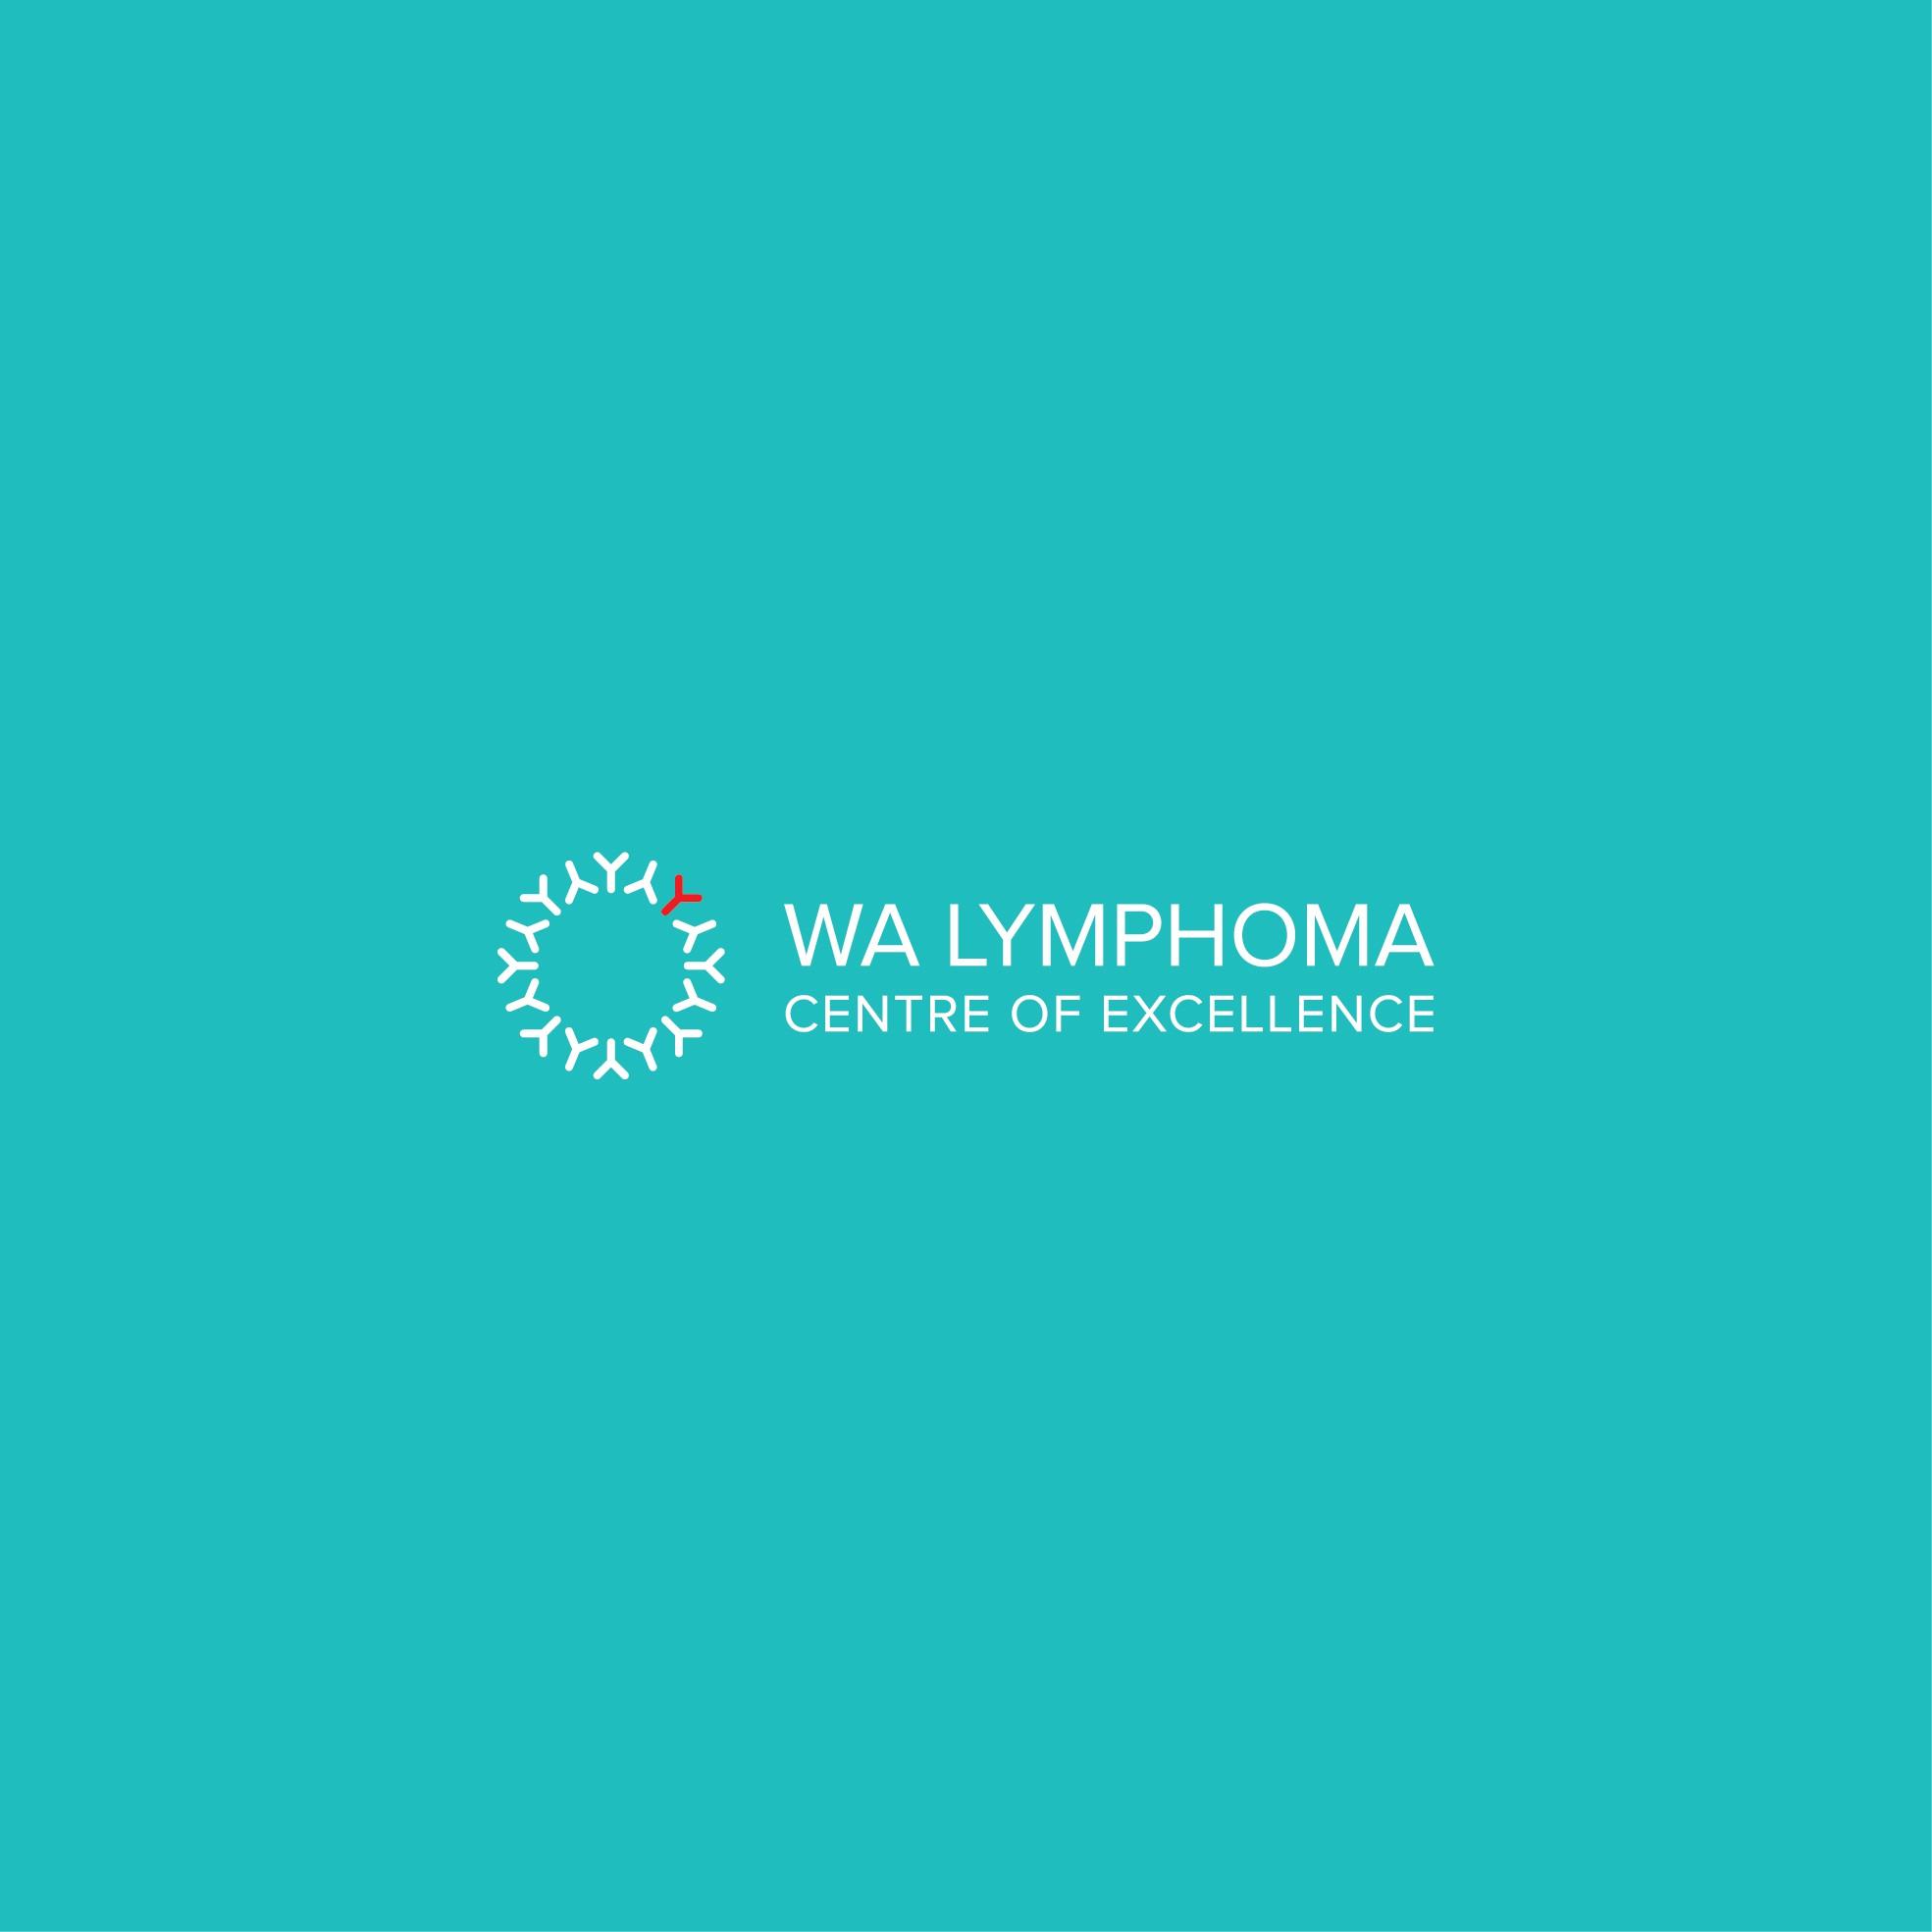 Cancer centre of excellence needs an inspiring new logo